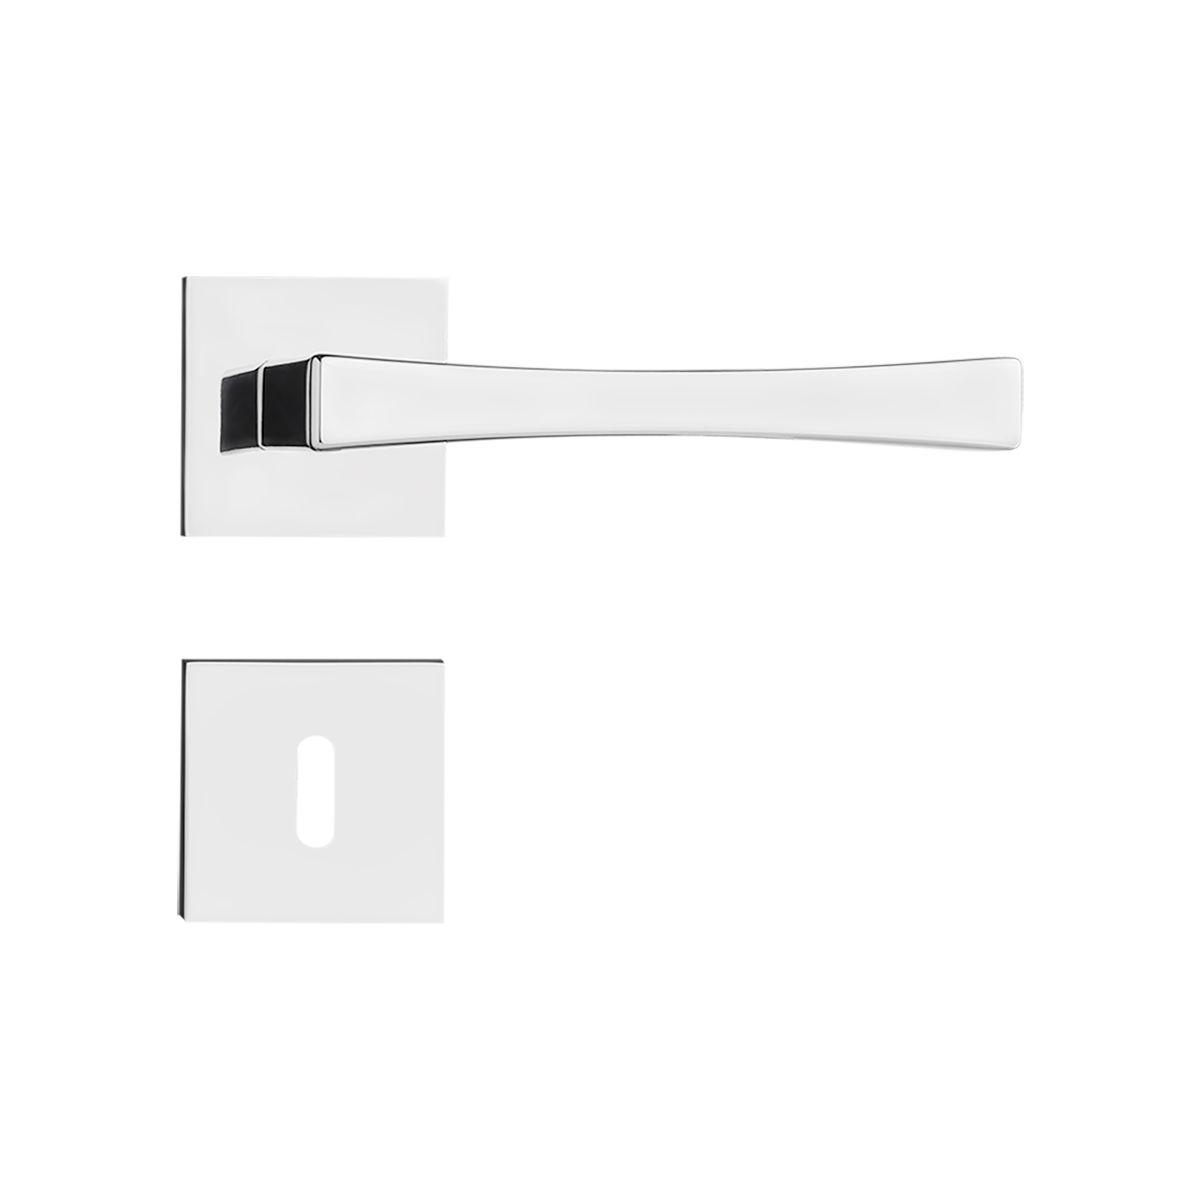 Kit Fechadura Vivaldi CR: 5 Interna; 3 Banheiro